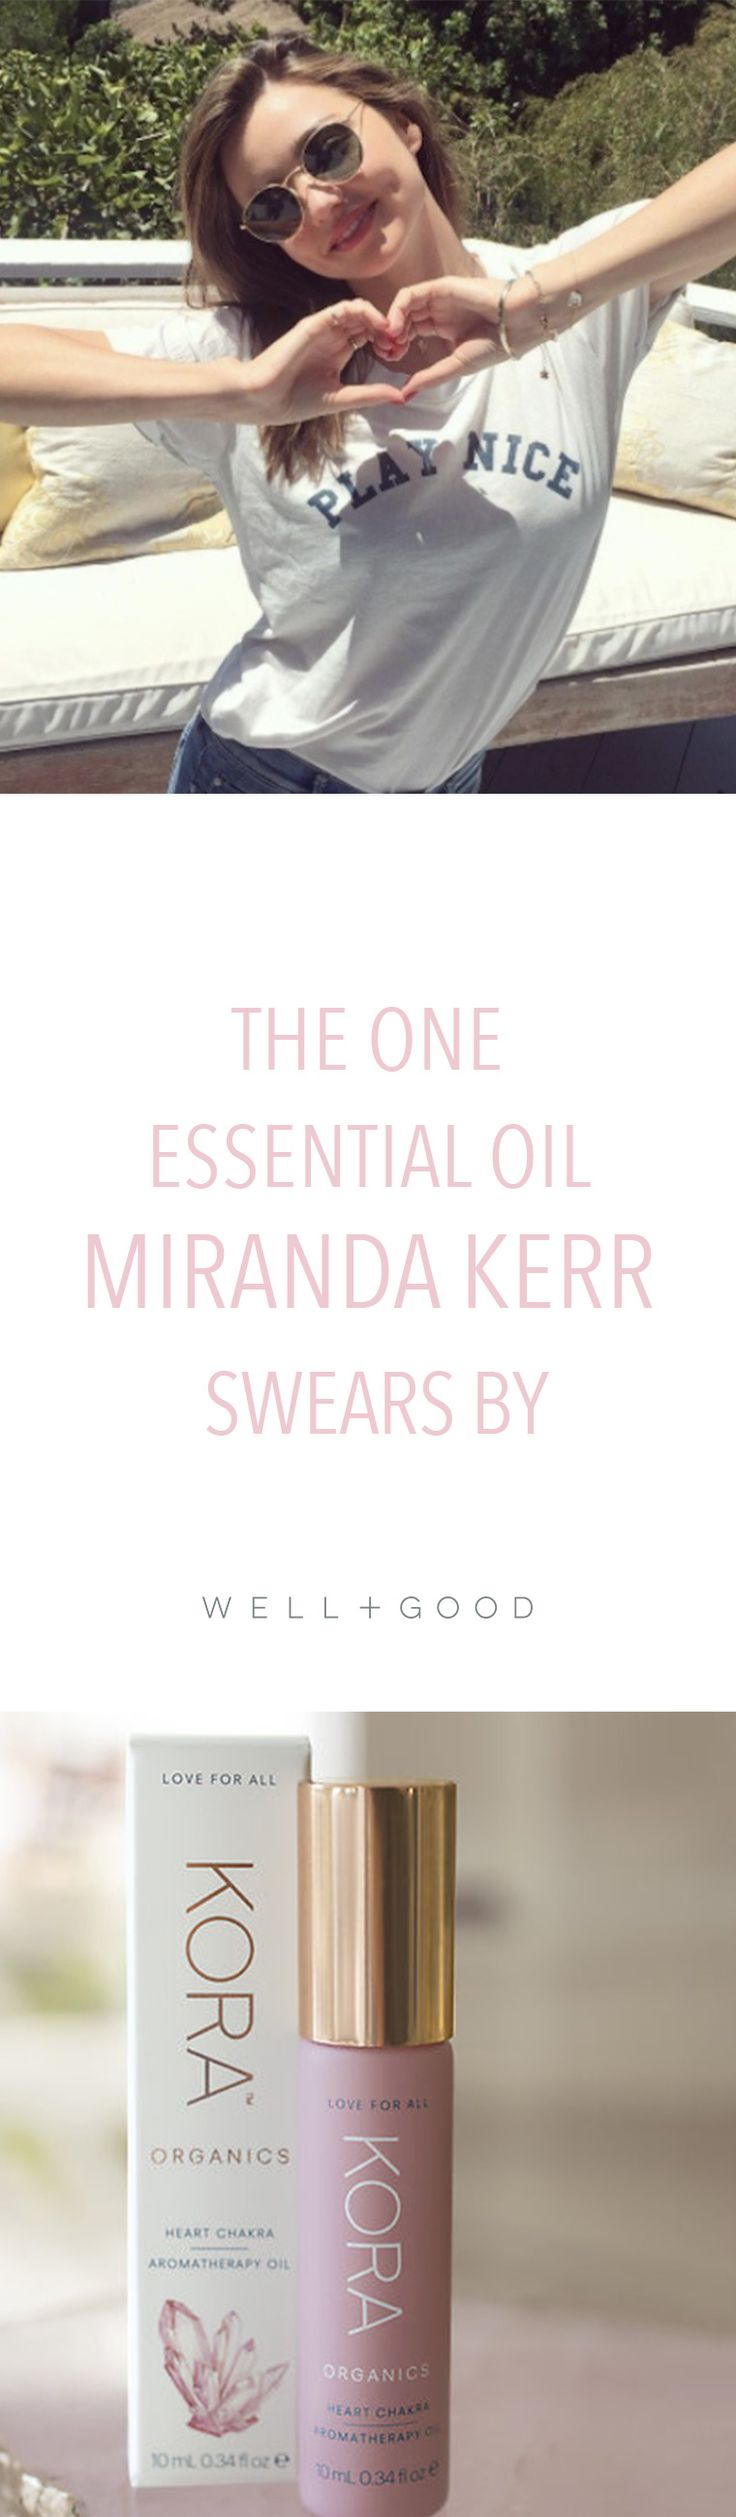 Miranda Kerr's essential-oil cure for depression.